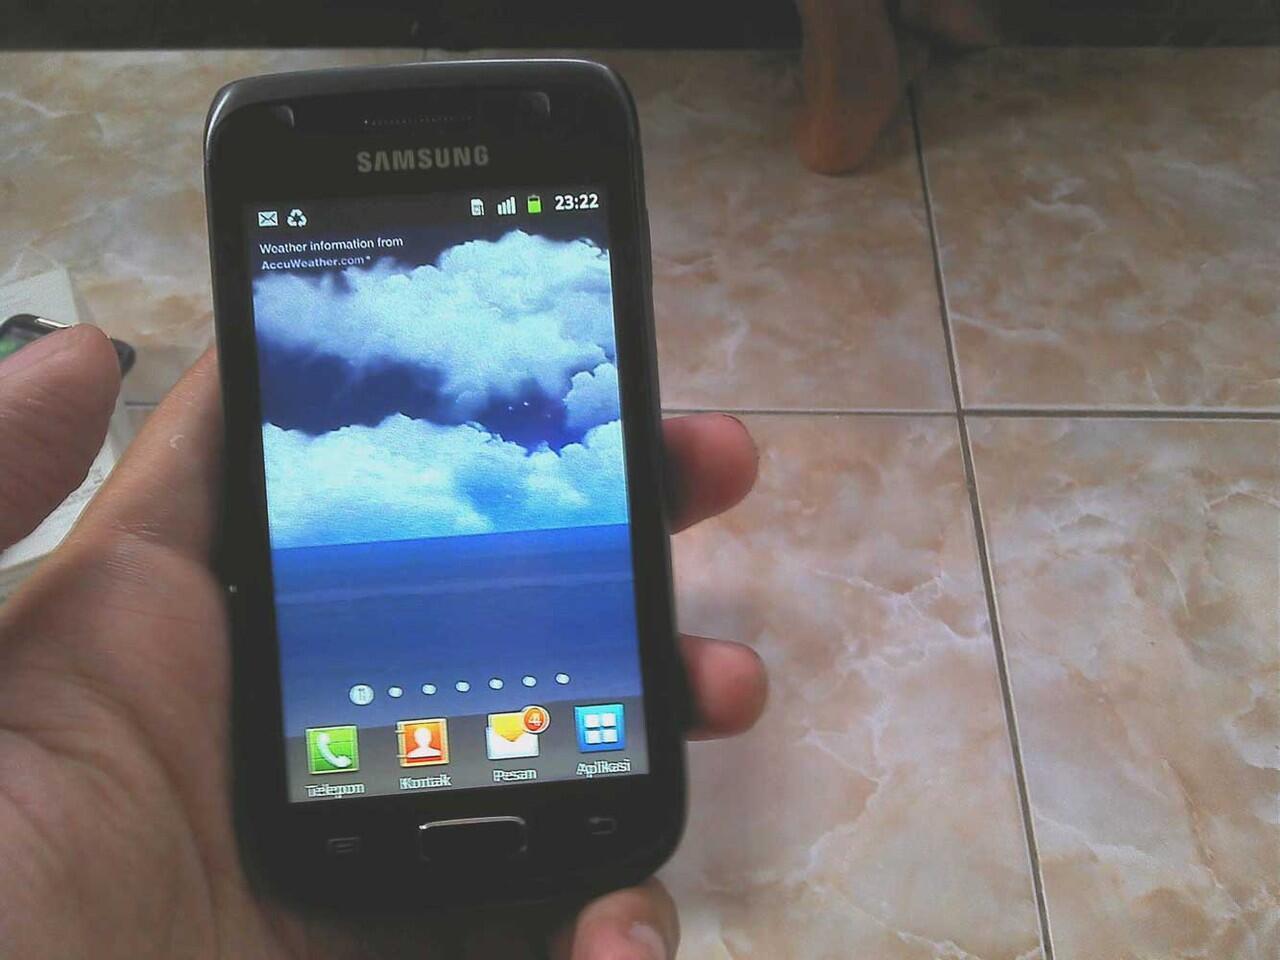 Samsung Galaxy Wonder Sejutaan Fullset!!